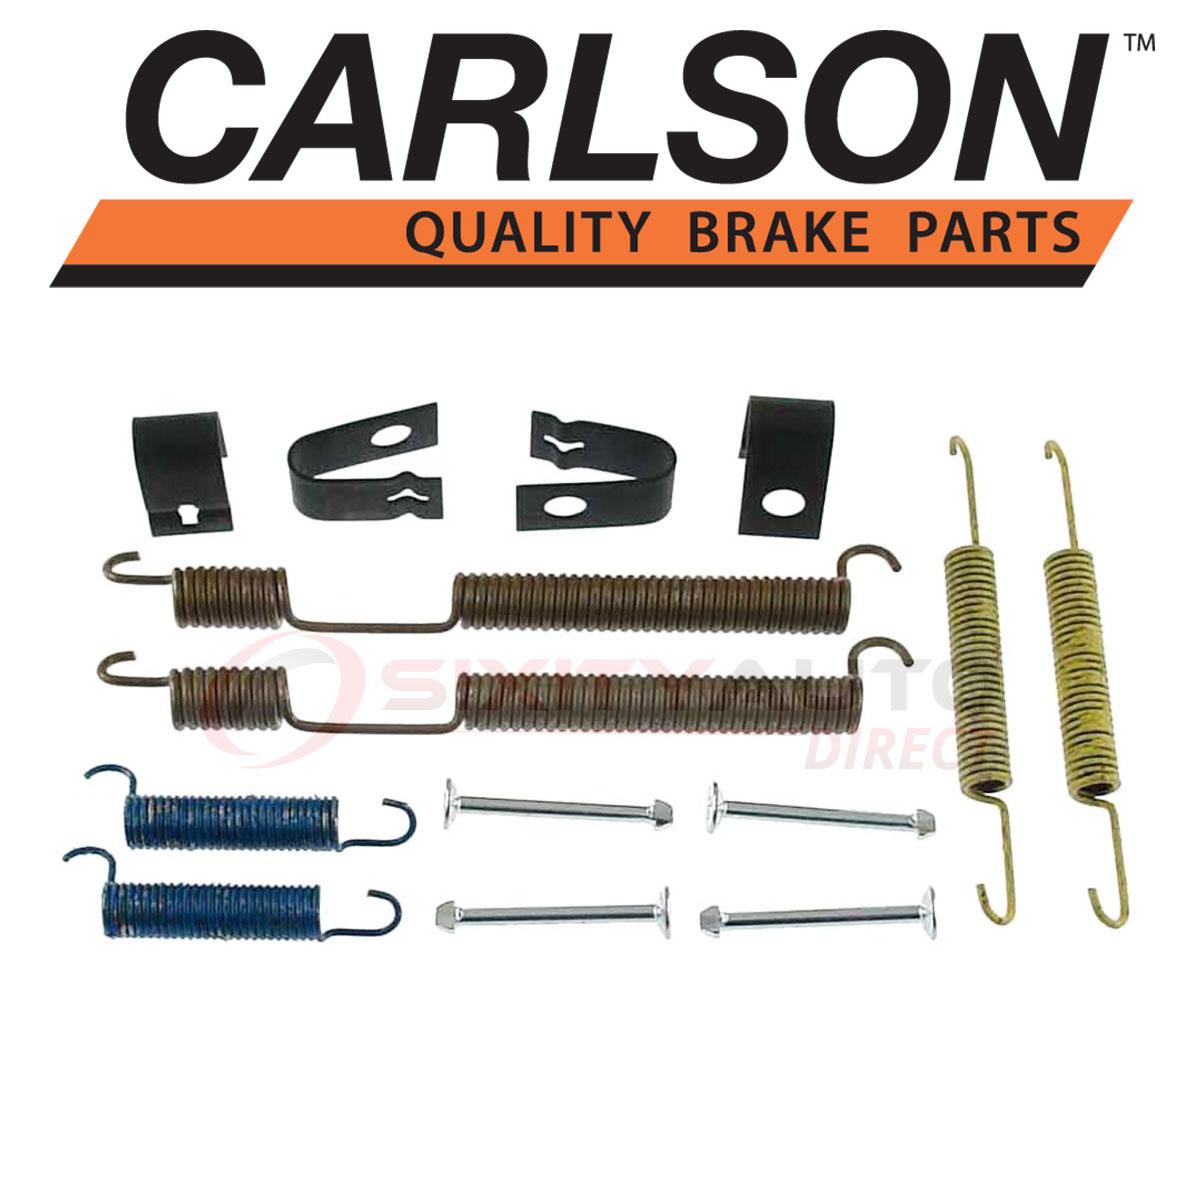 Carlson Rear Drum Brake Hardware Kit for 1976-1997 Ford F-350 Shoe uz